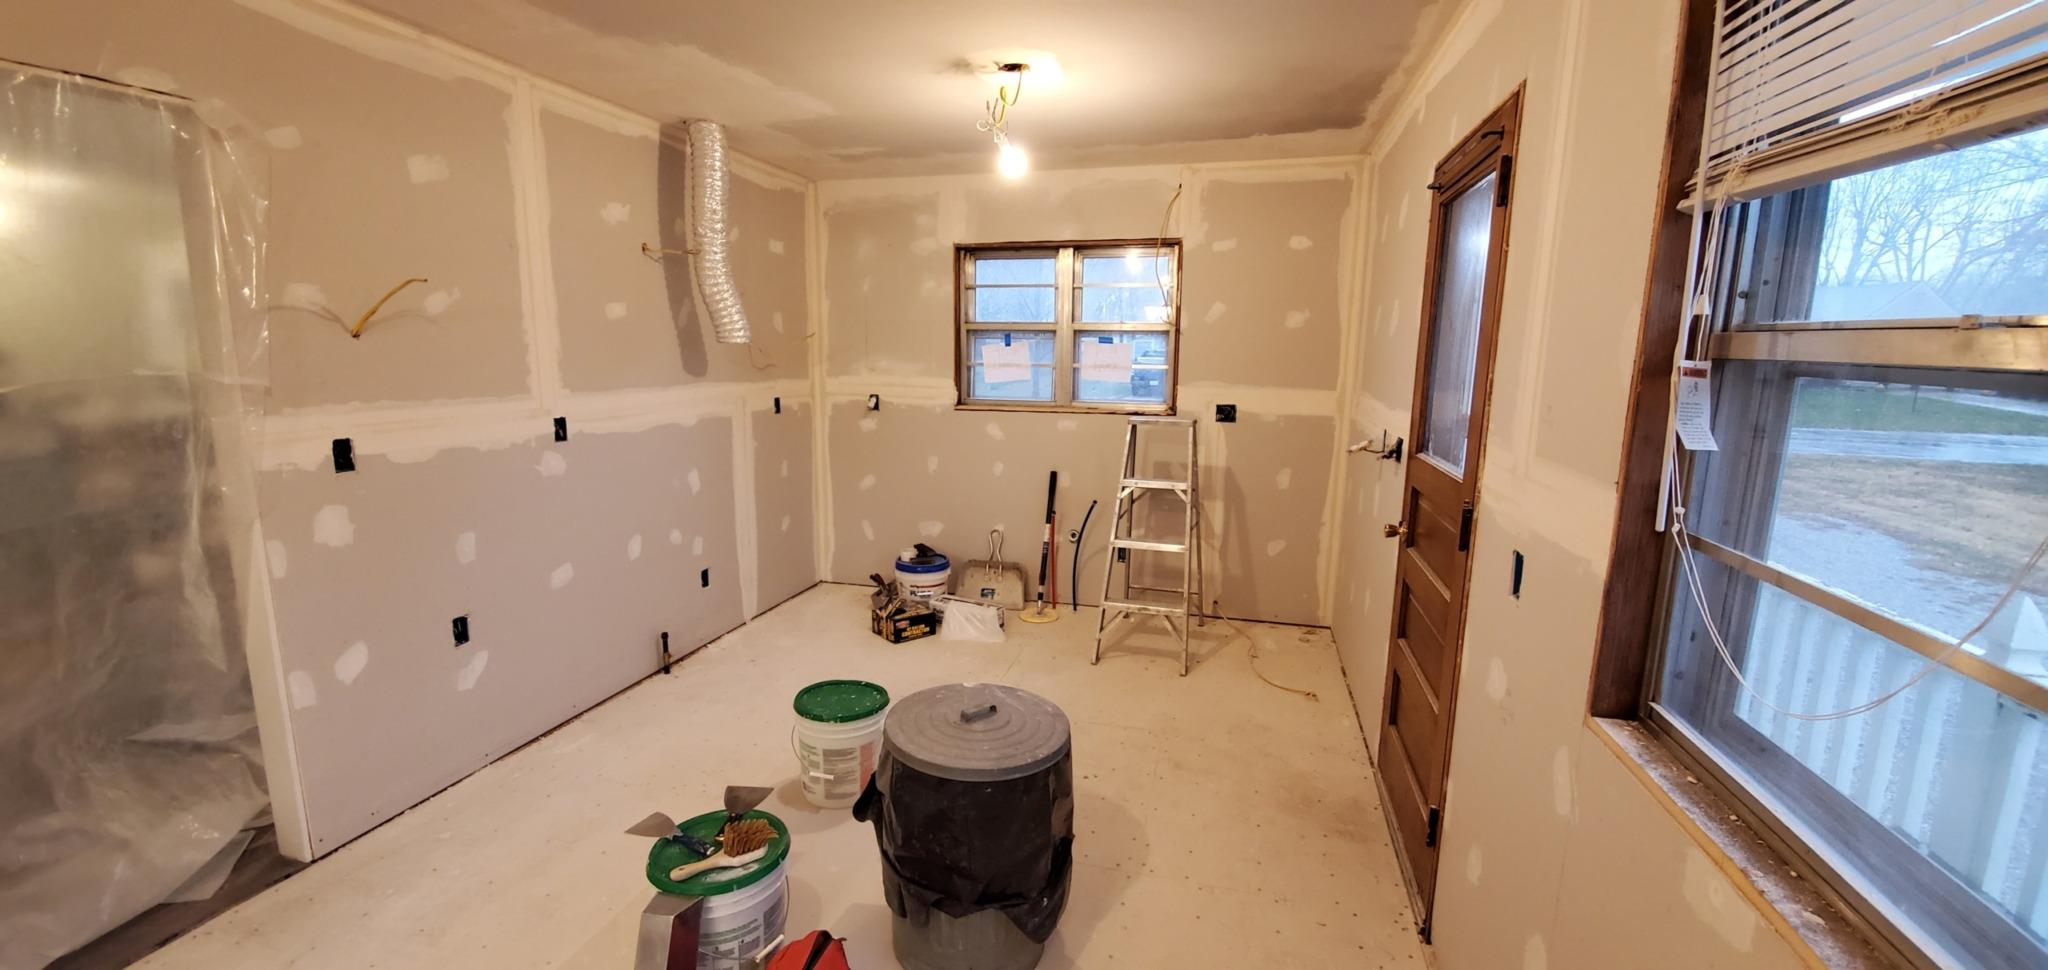 Kitchen Remodel 3